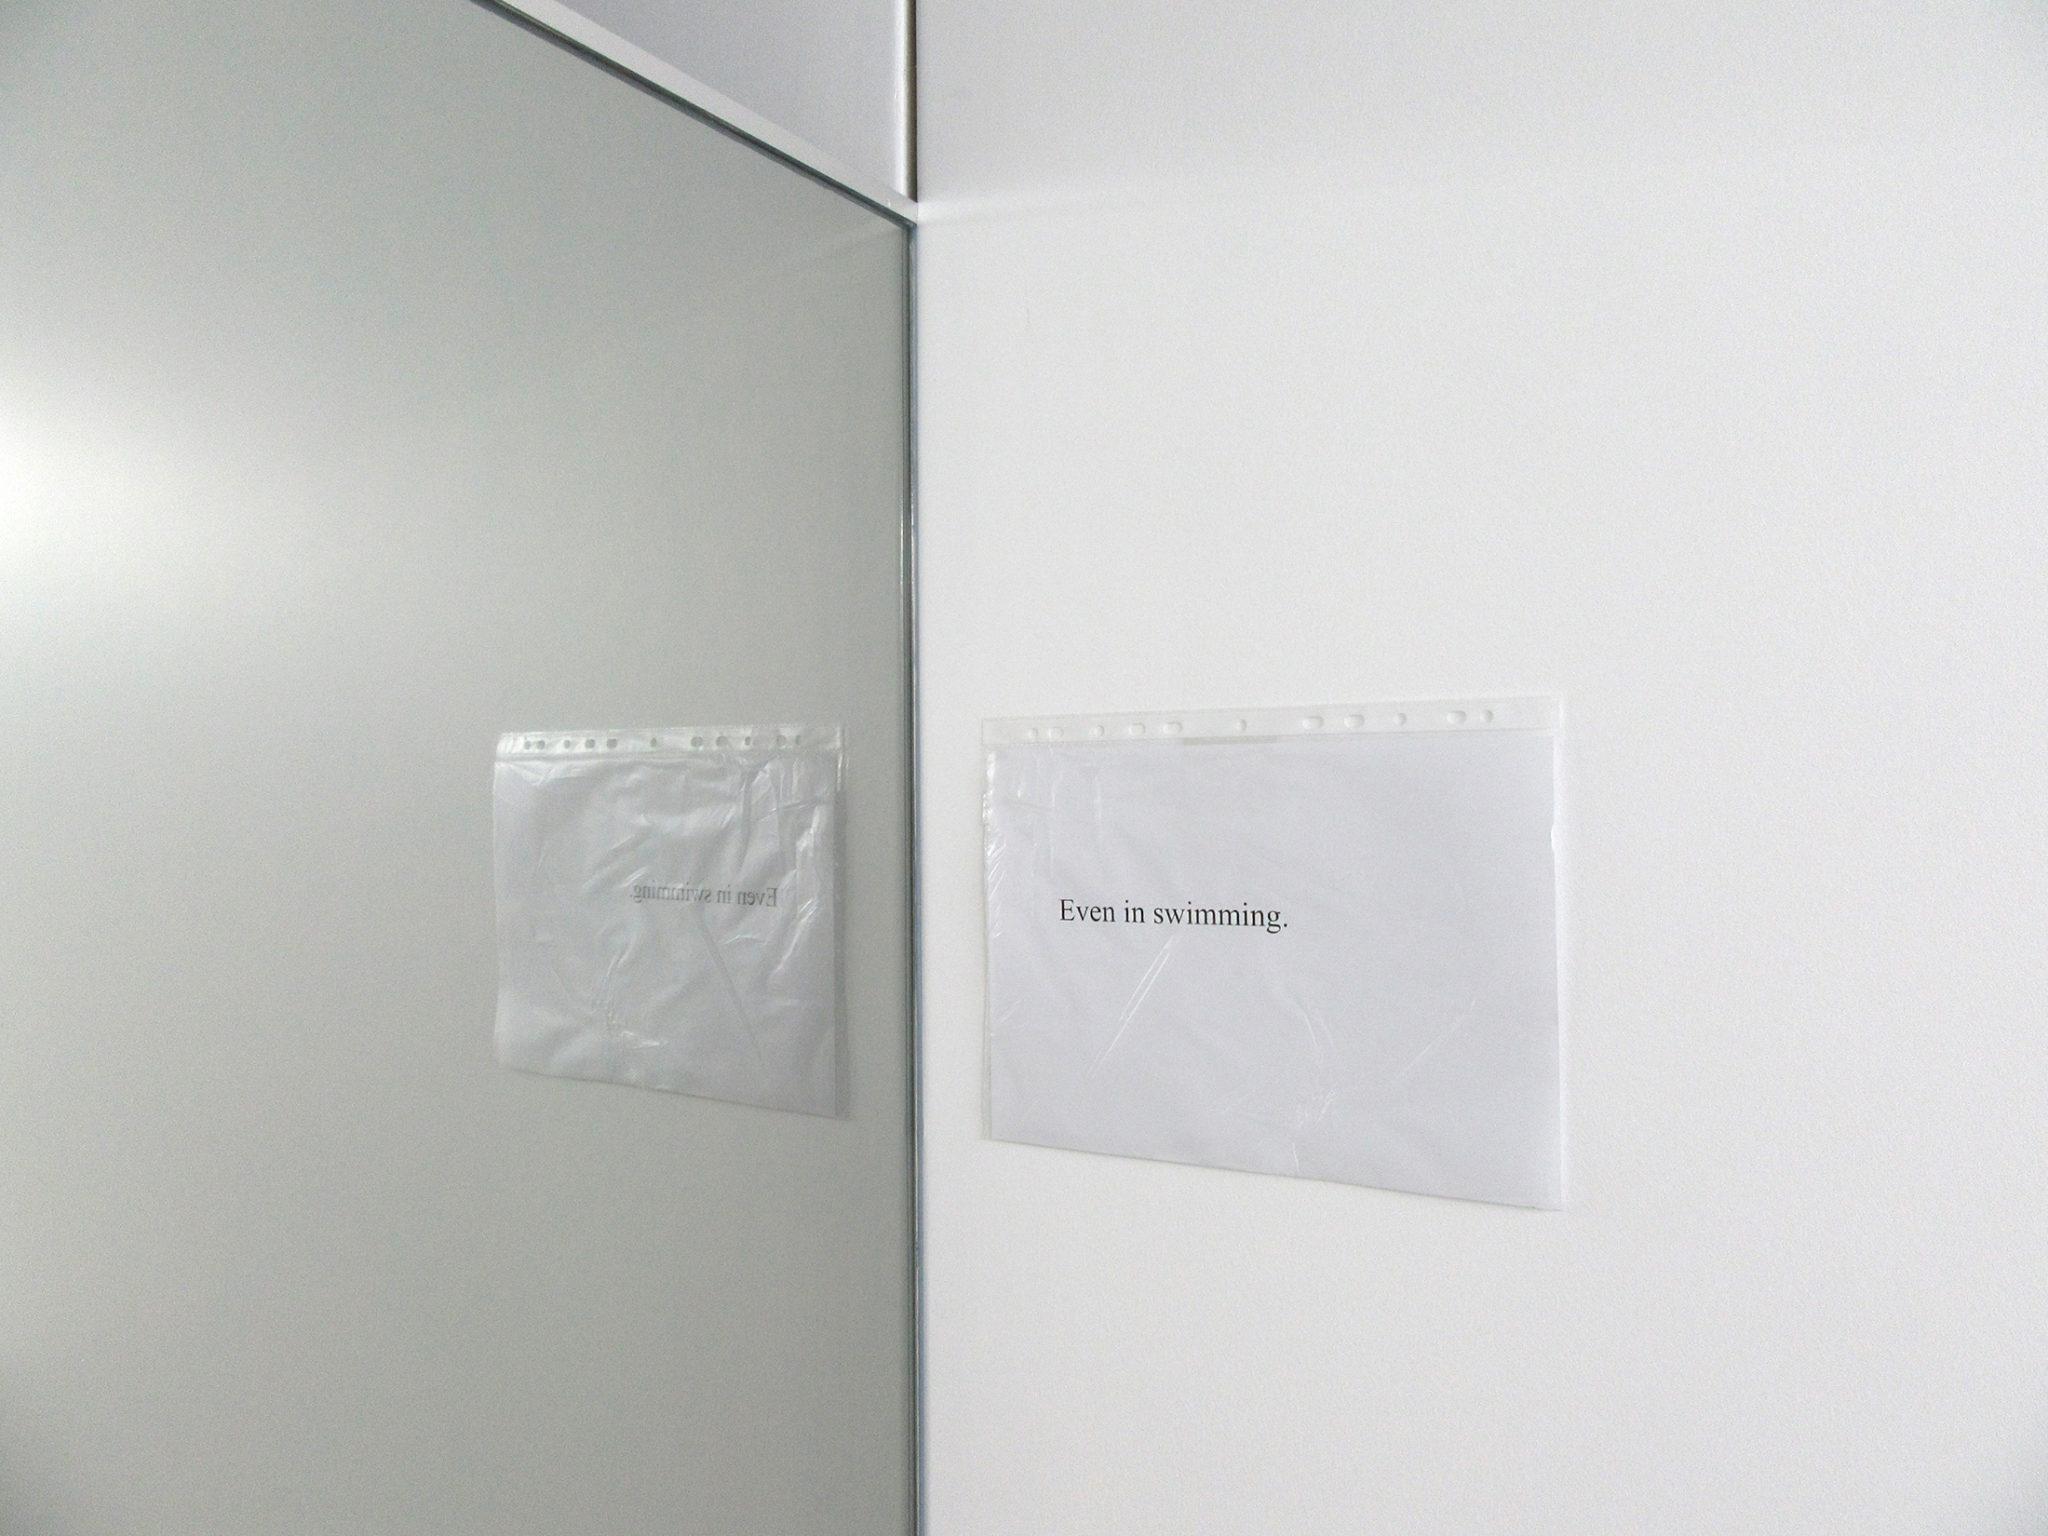 sannahelenaberger-theedgemustbescalloped-diorama-20